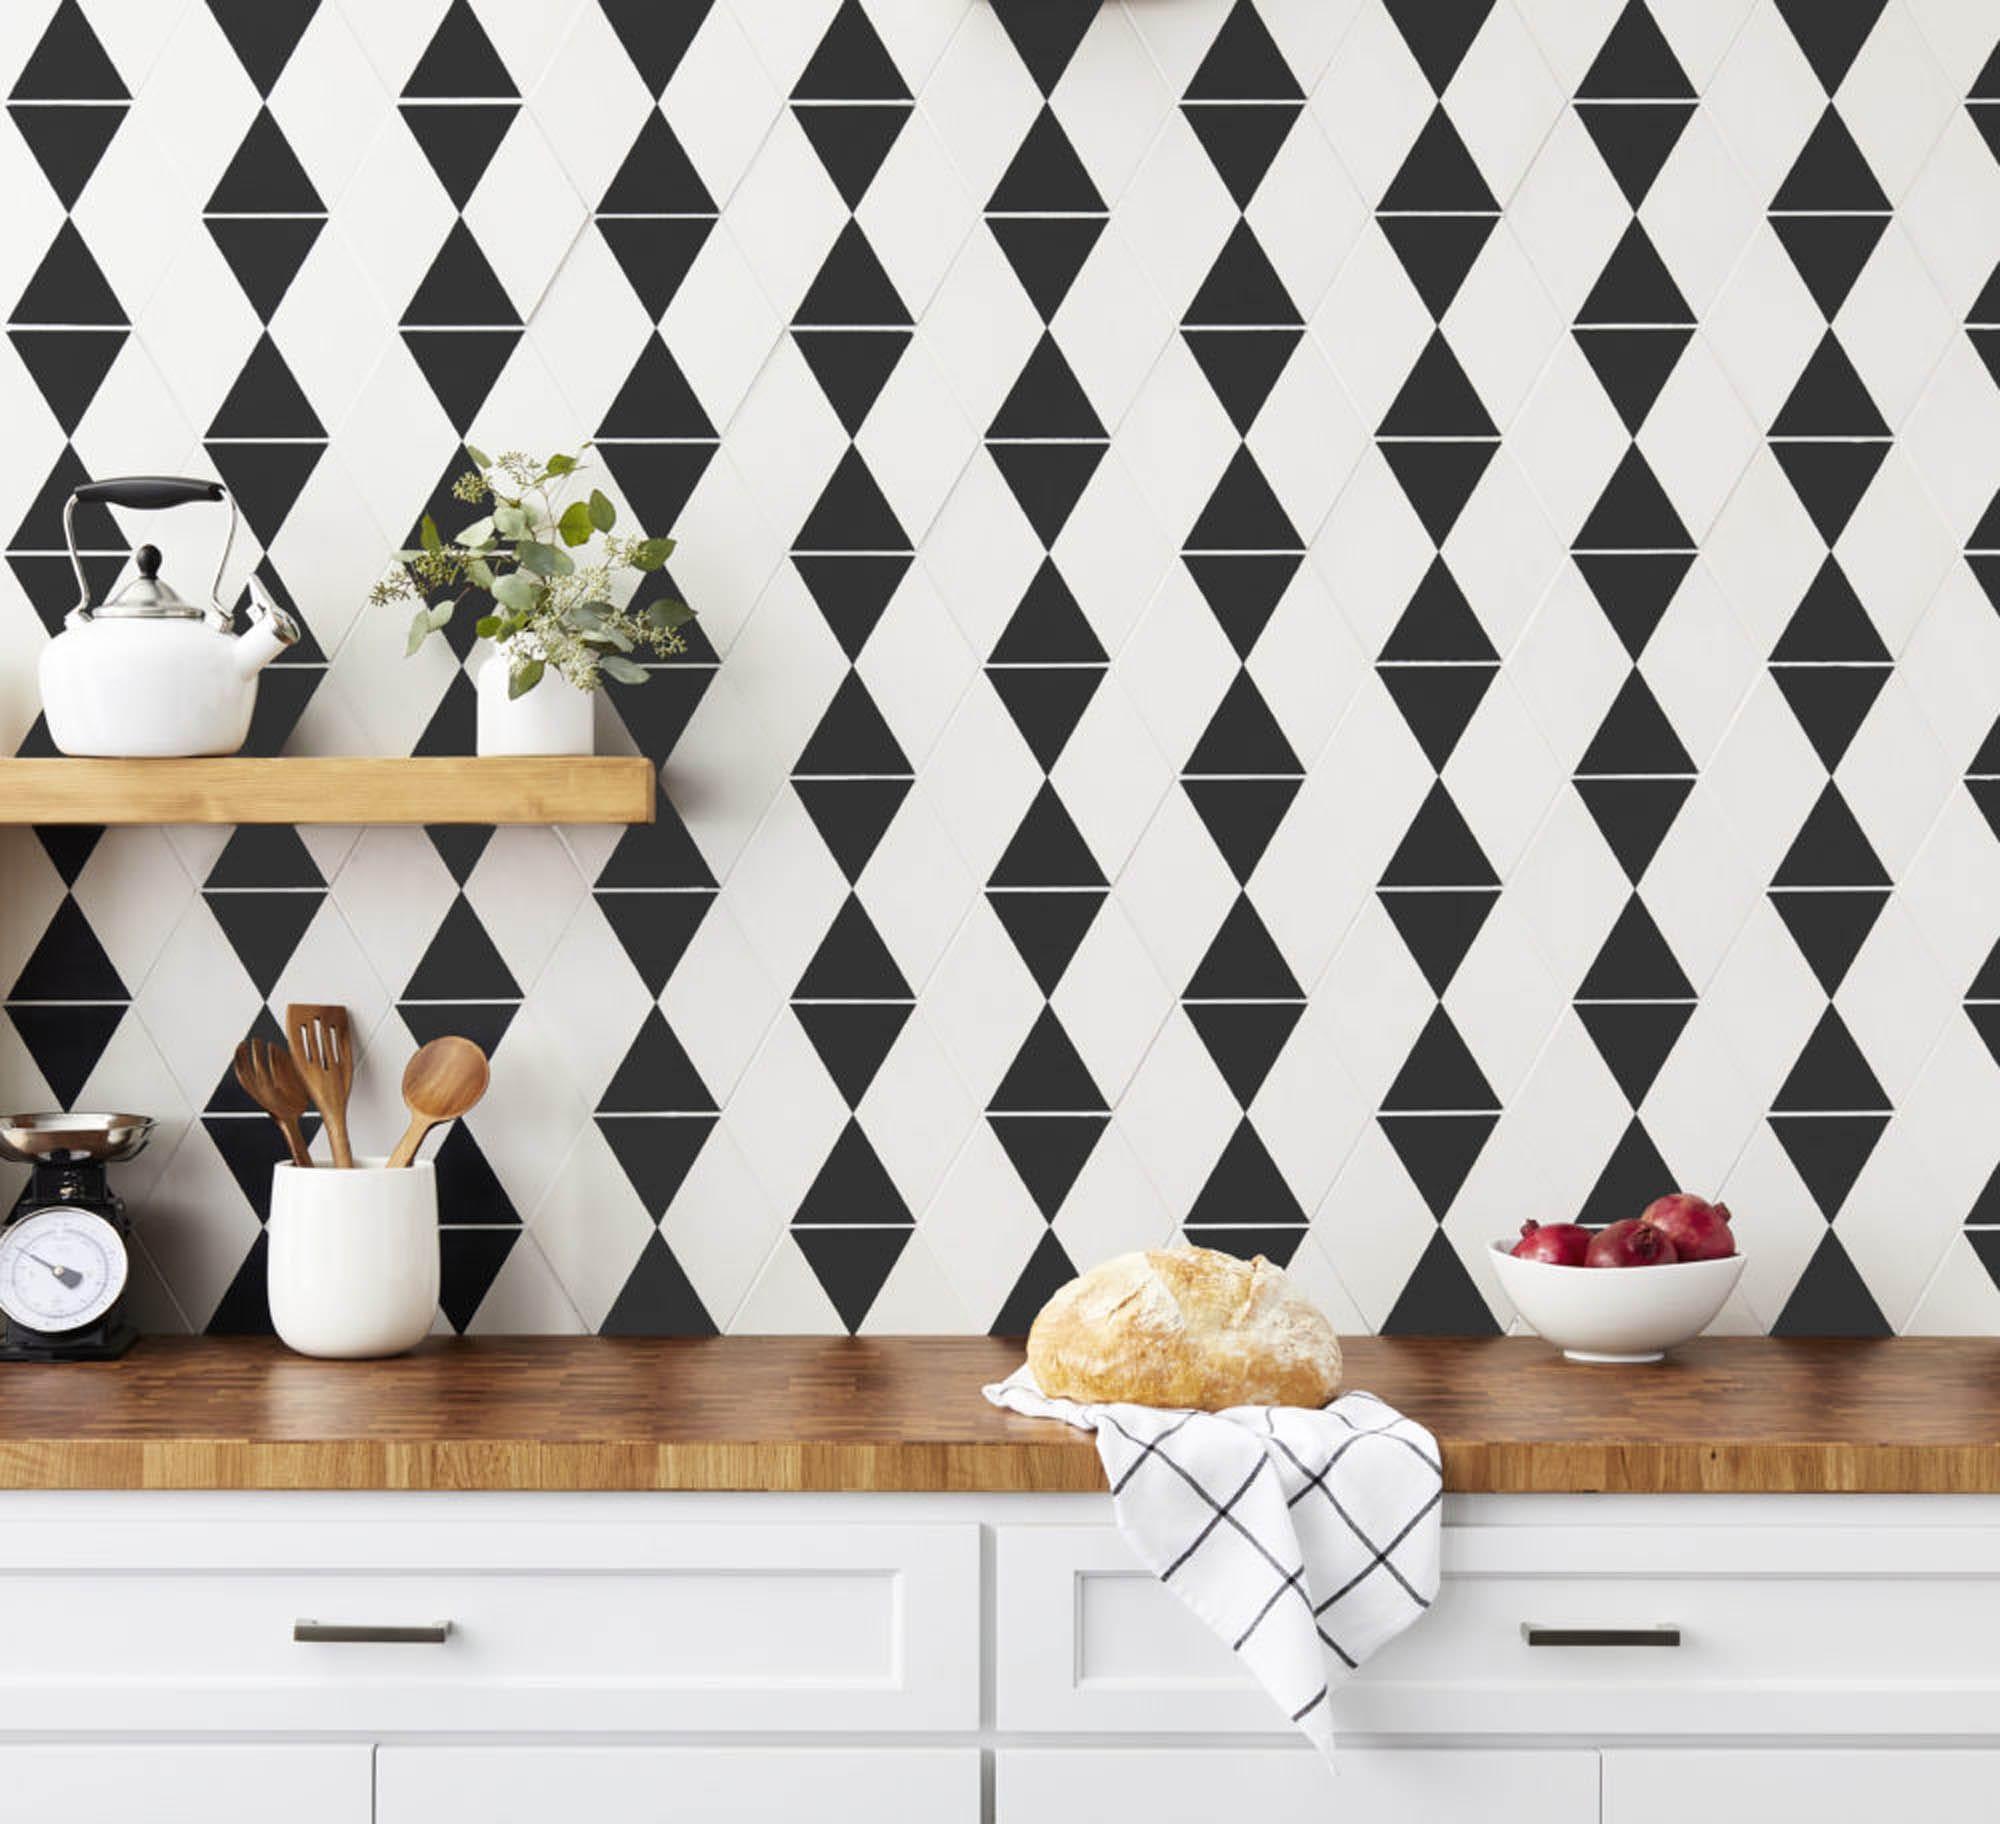 Black and white diamond wall tile.